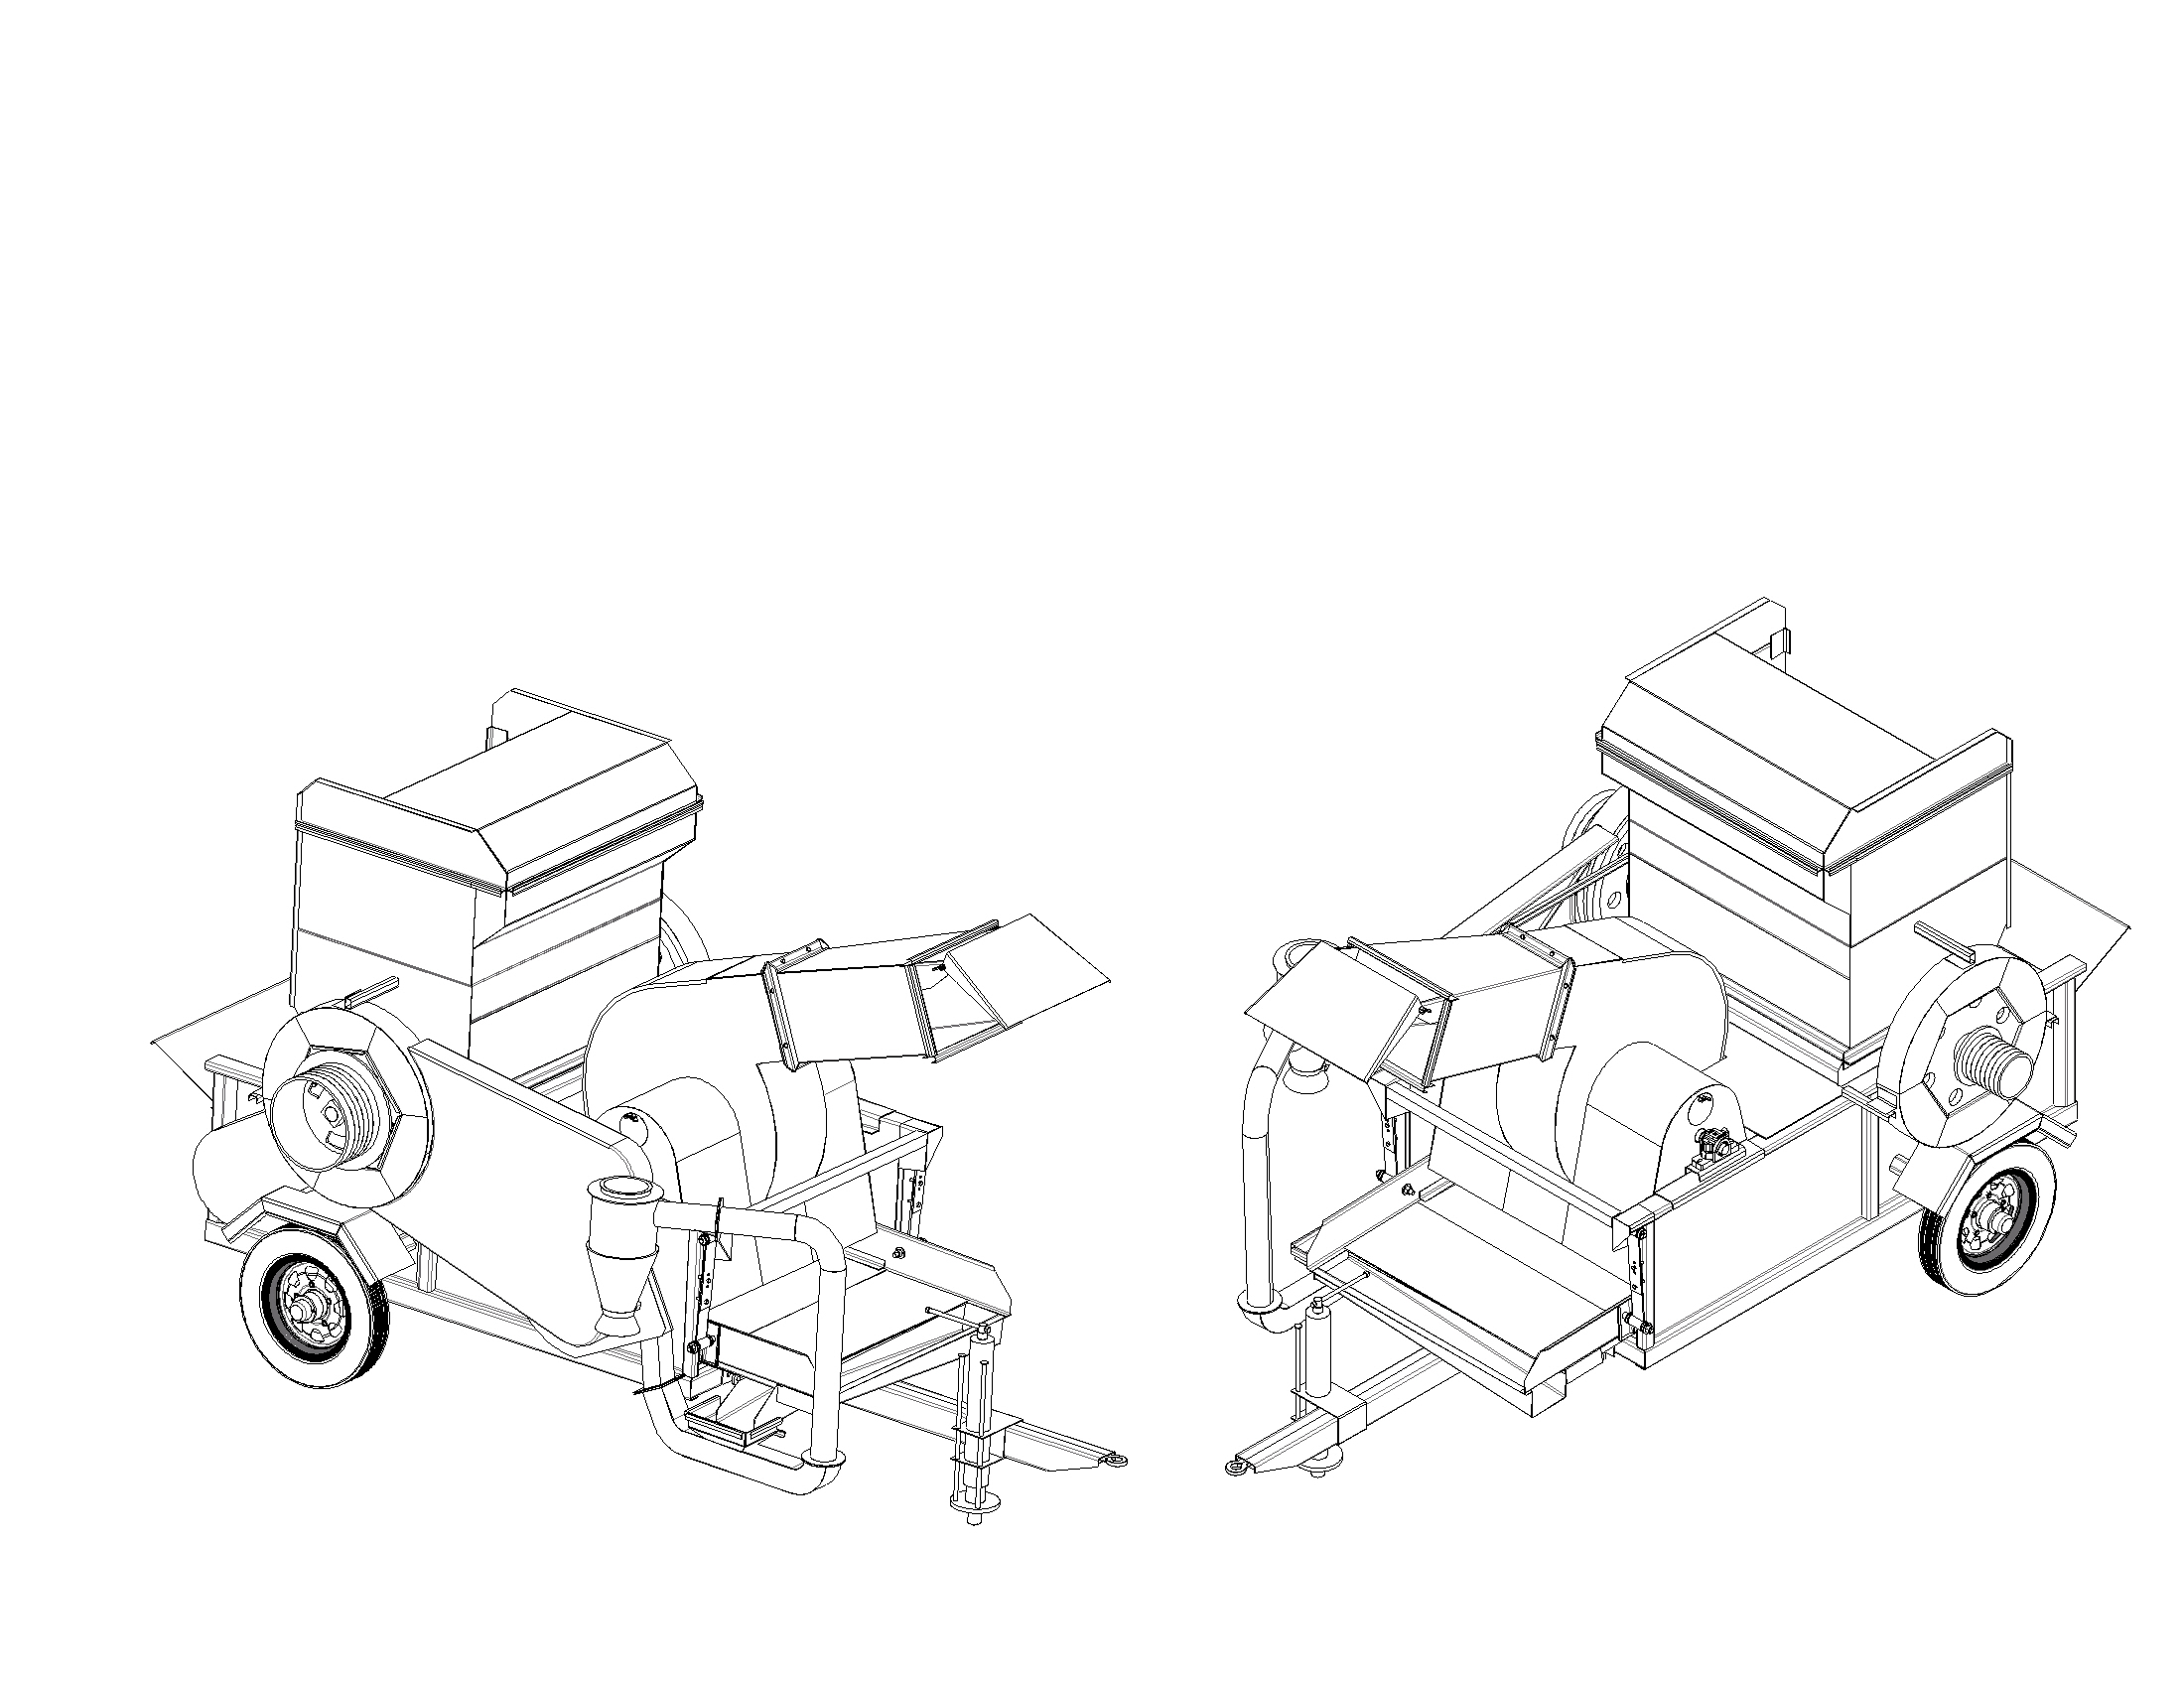 Mechanical Engineering Drawing Symbols Free Download